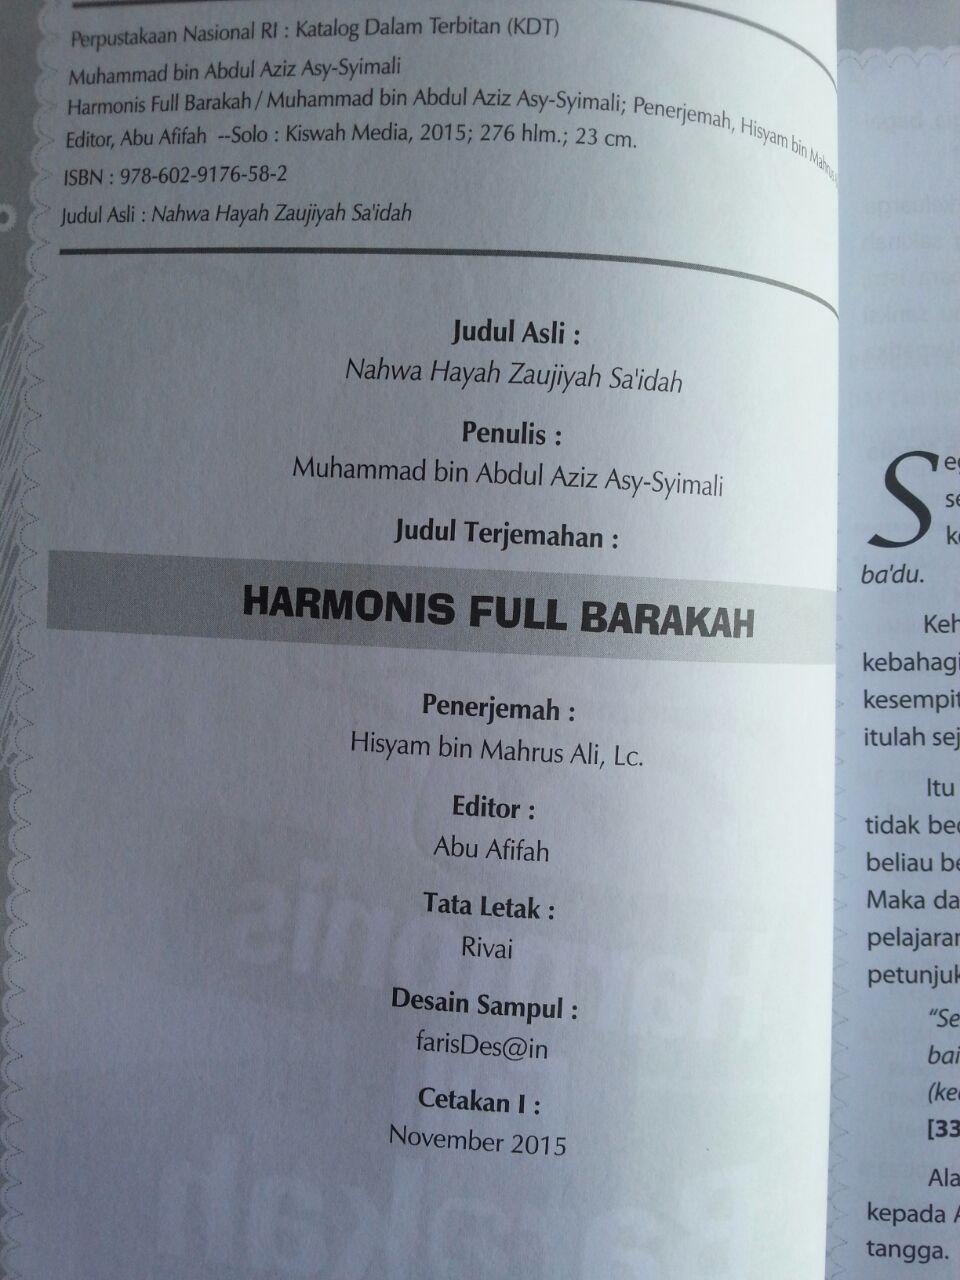 Buku Harmonis Full Barakah Cara Nabi Mewujudkan Keharmonisan isi